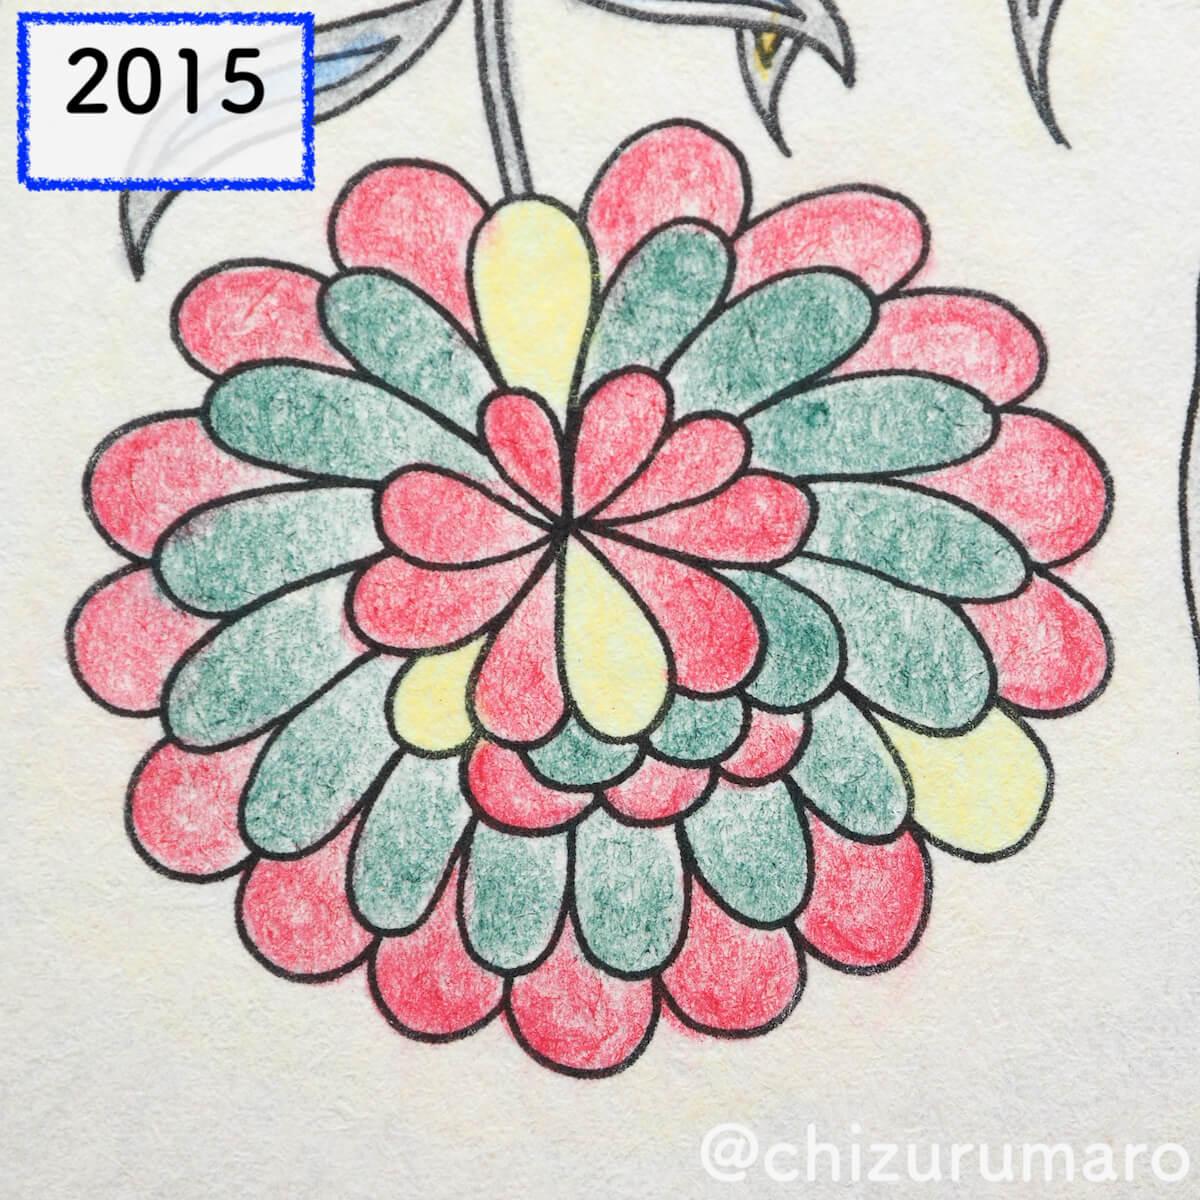 f:id:chizurumaro:20200511124303j:plain